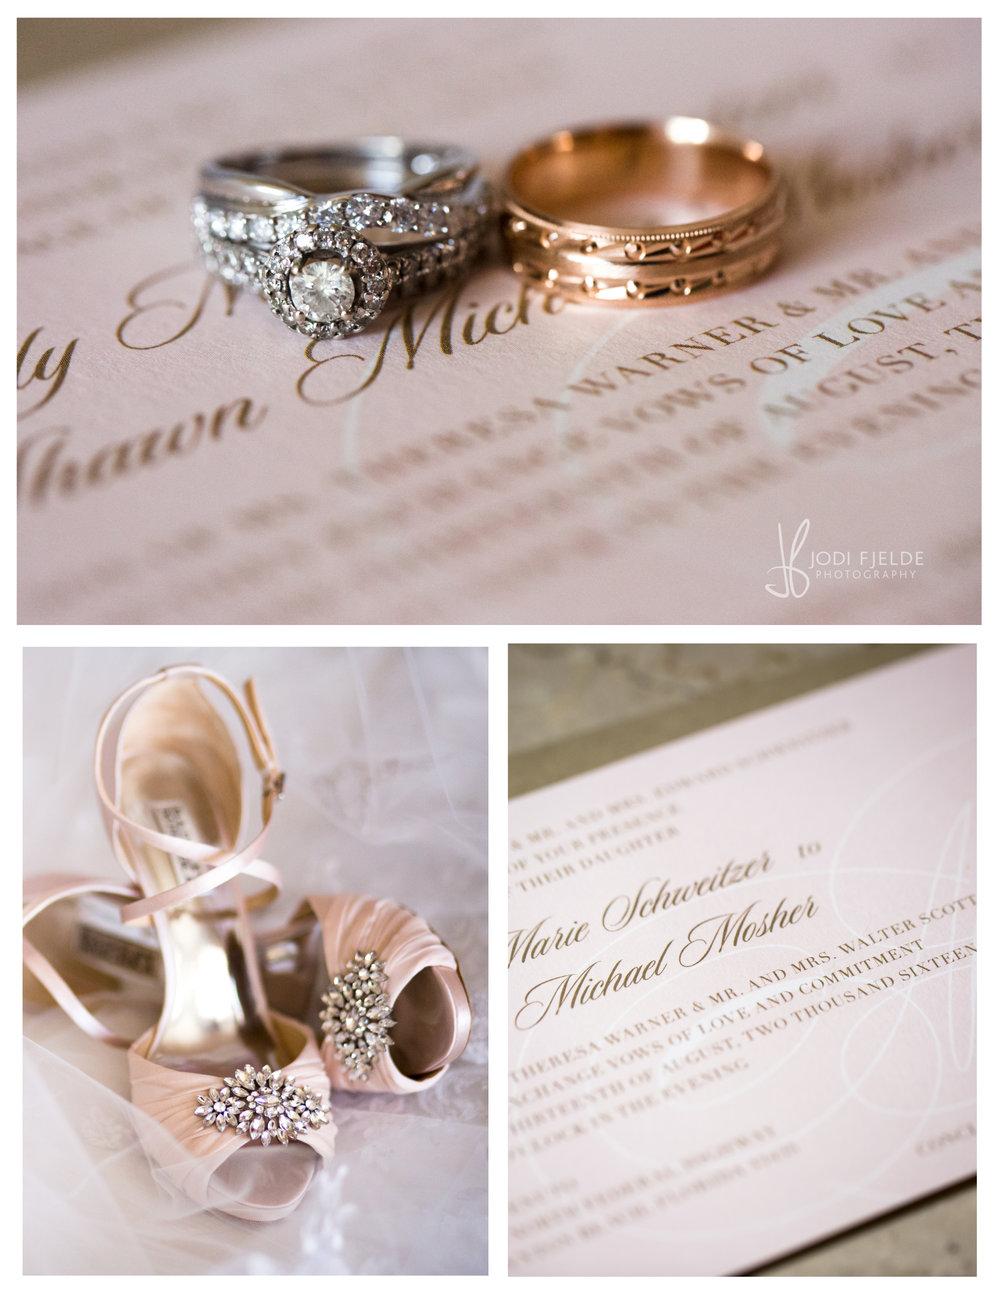 Benvenuto_Boynton Beach_ Wedding_Emily_&_Shawn 3.jpg